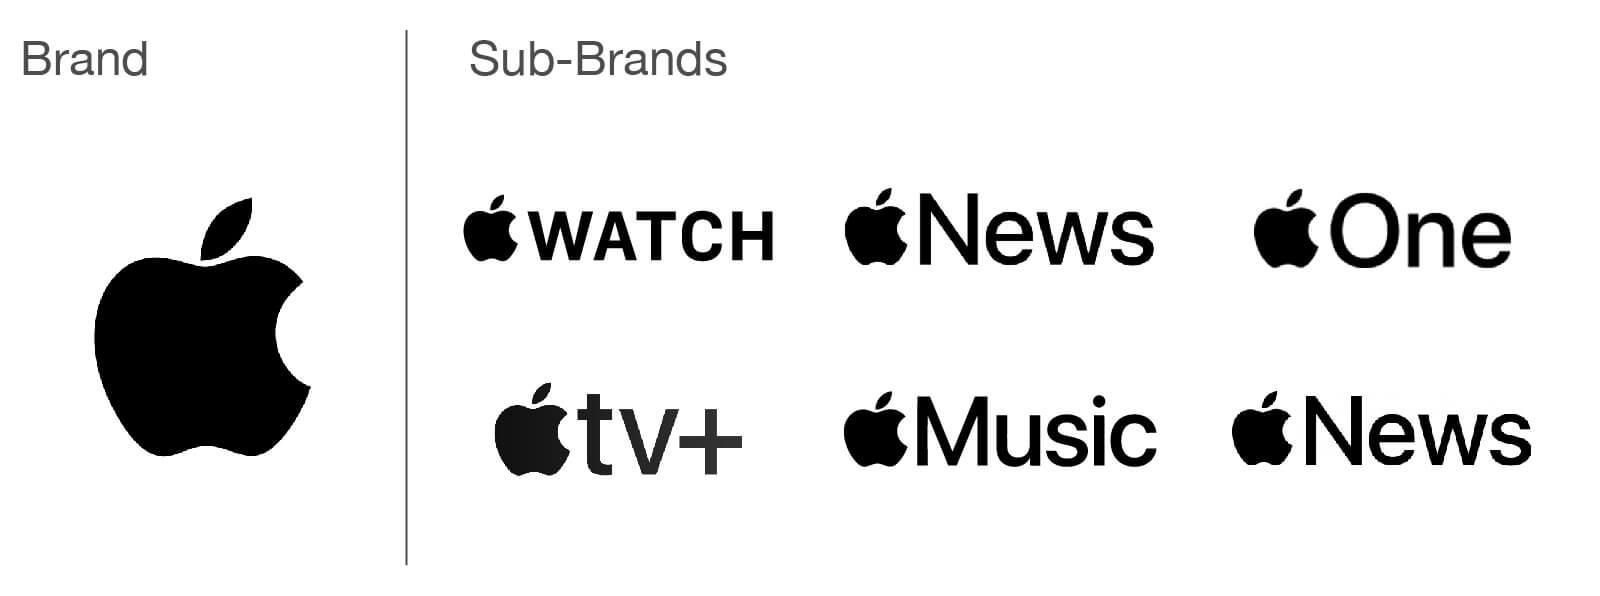 Apple sub brand logos